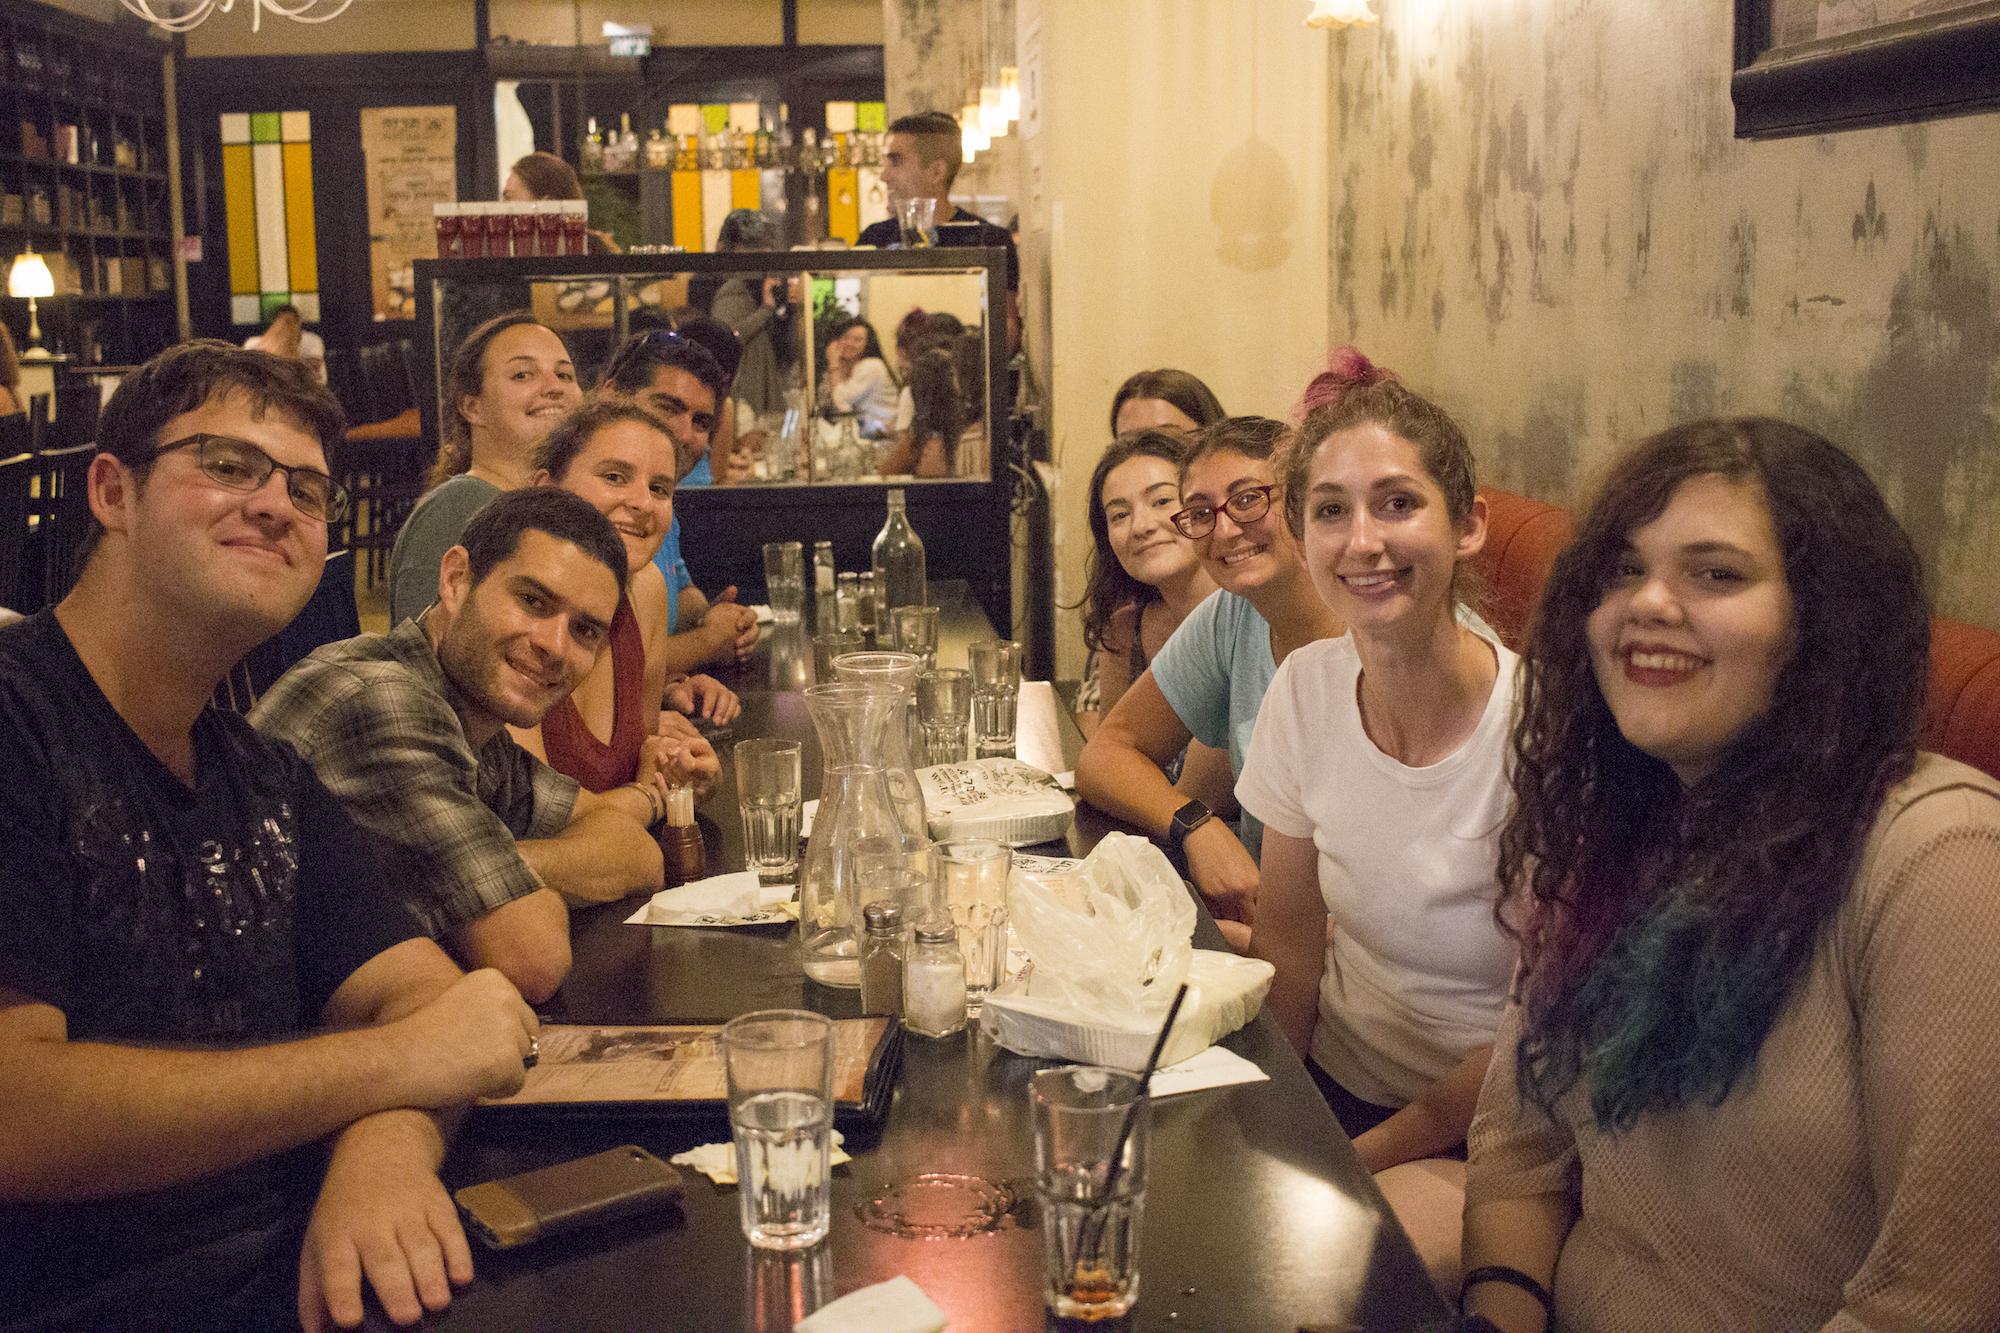 A group of friends bid farewell to Geena Matuson (@geenamatuson) at a dinner in Rishon LeZion, Israel, September 2017.